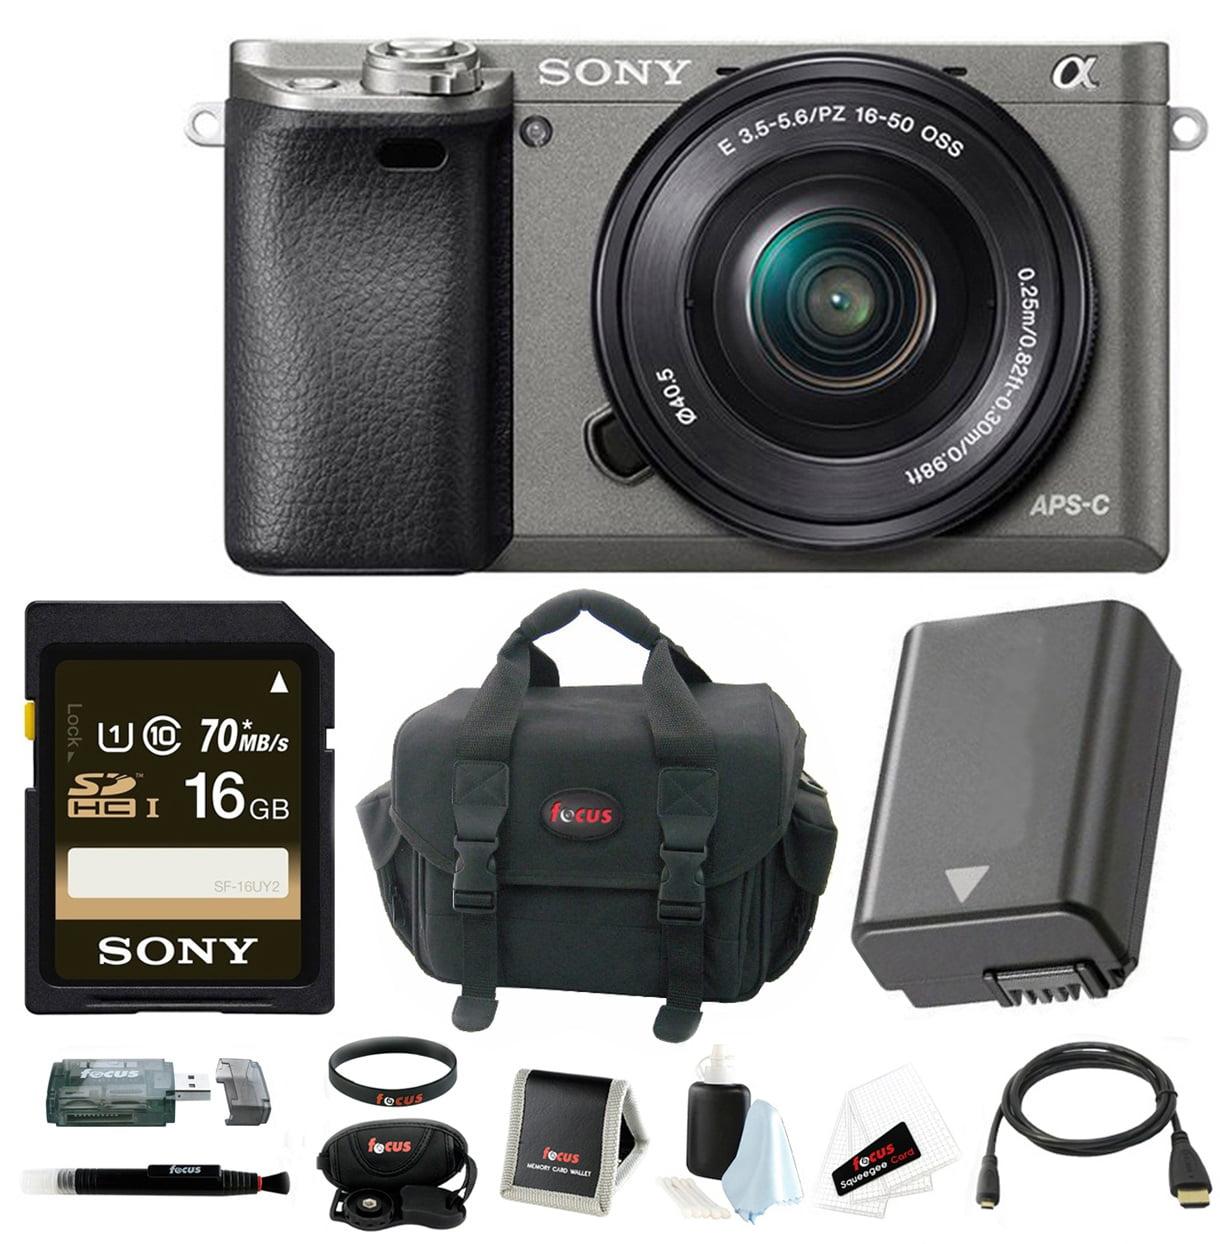 Sony Alpha a6000 Mirrorless Camera w/ 16-50mm Lens Accessory Bundle - Graphite